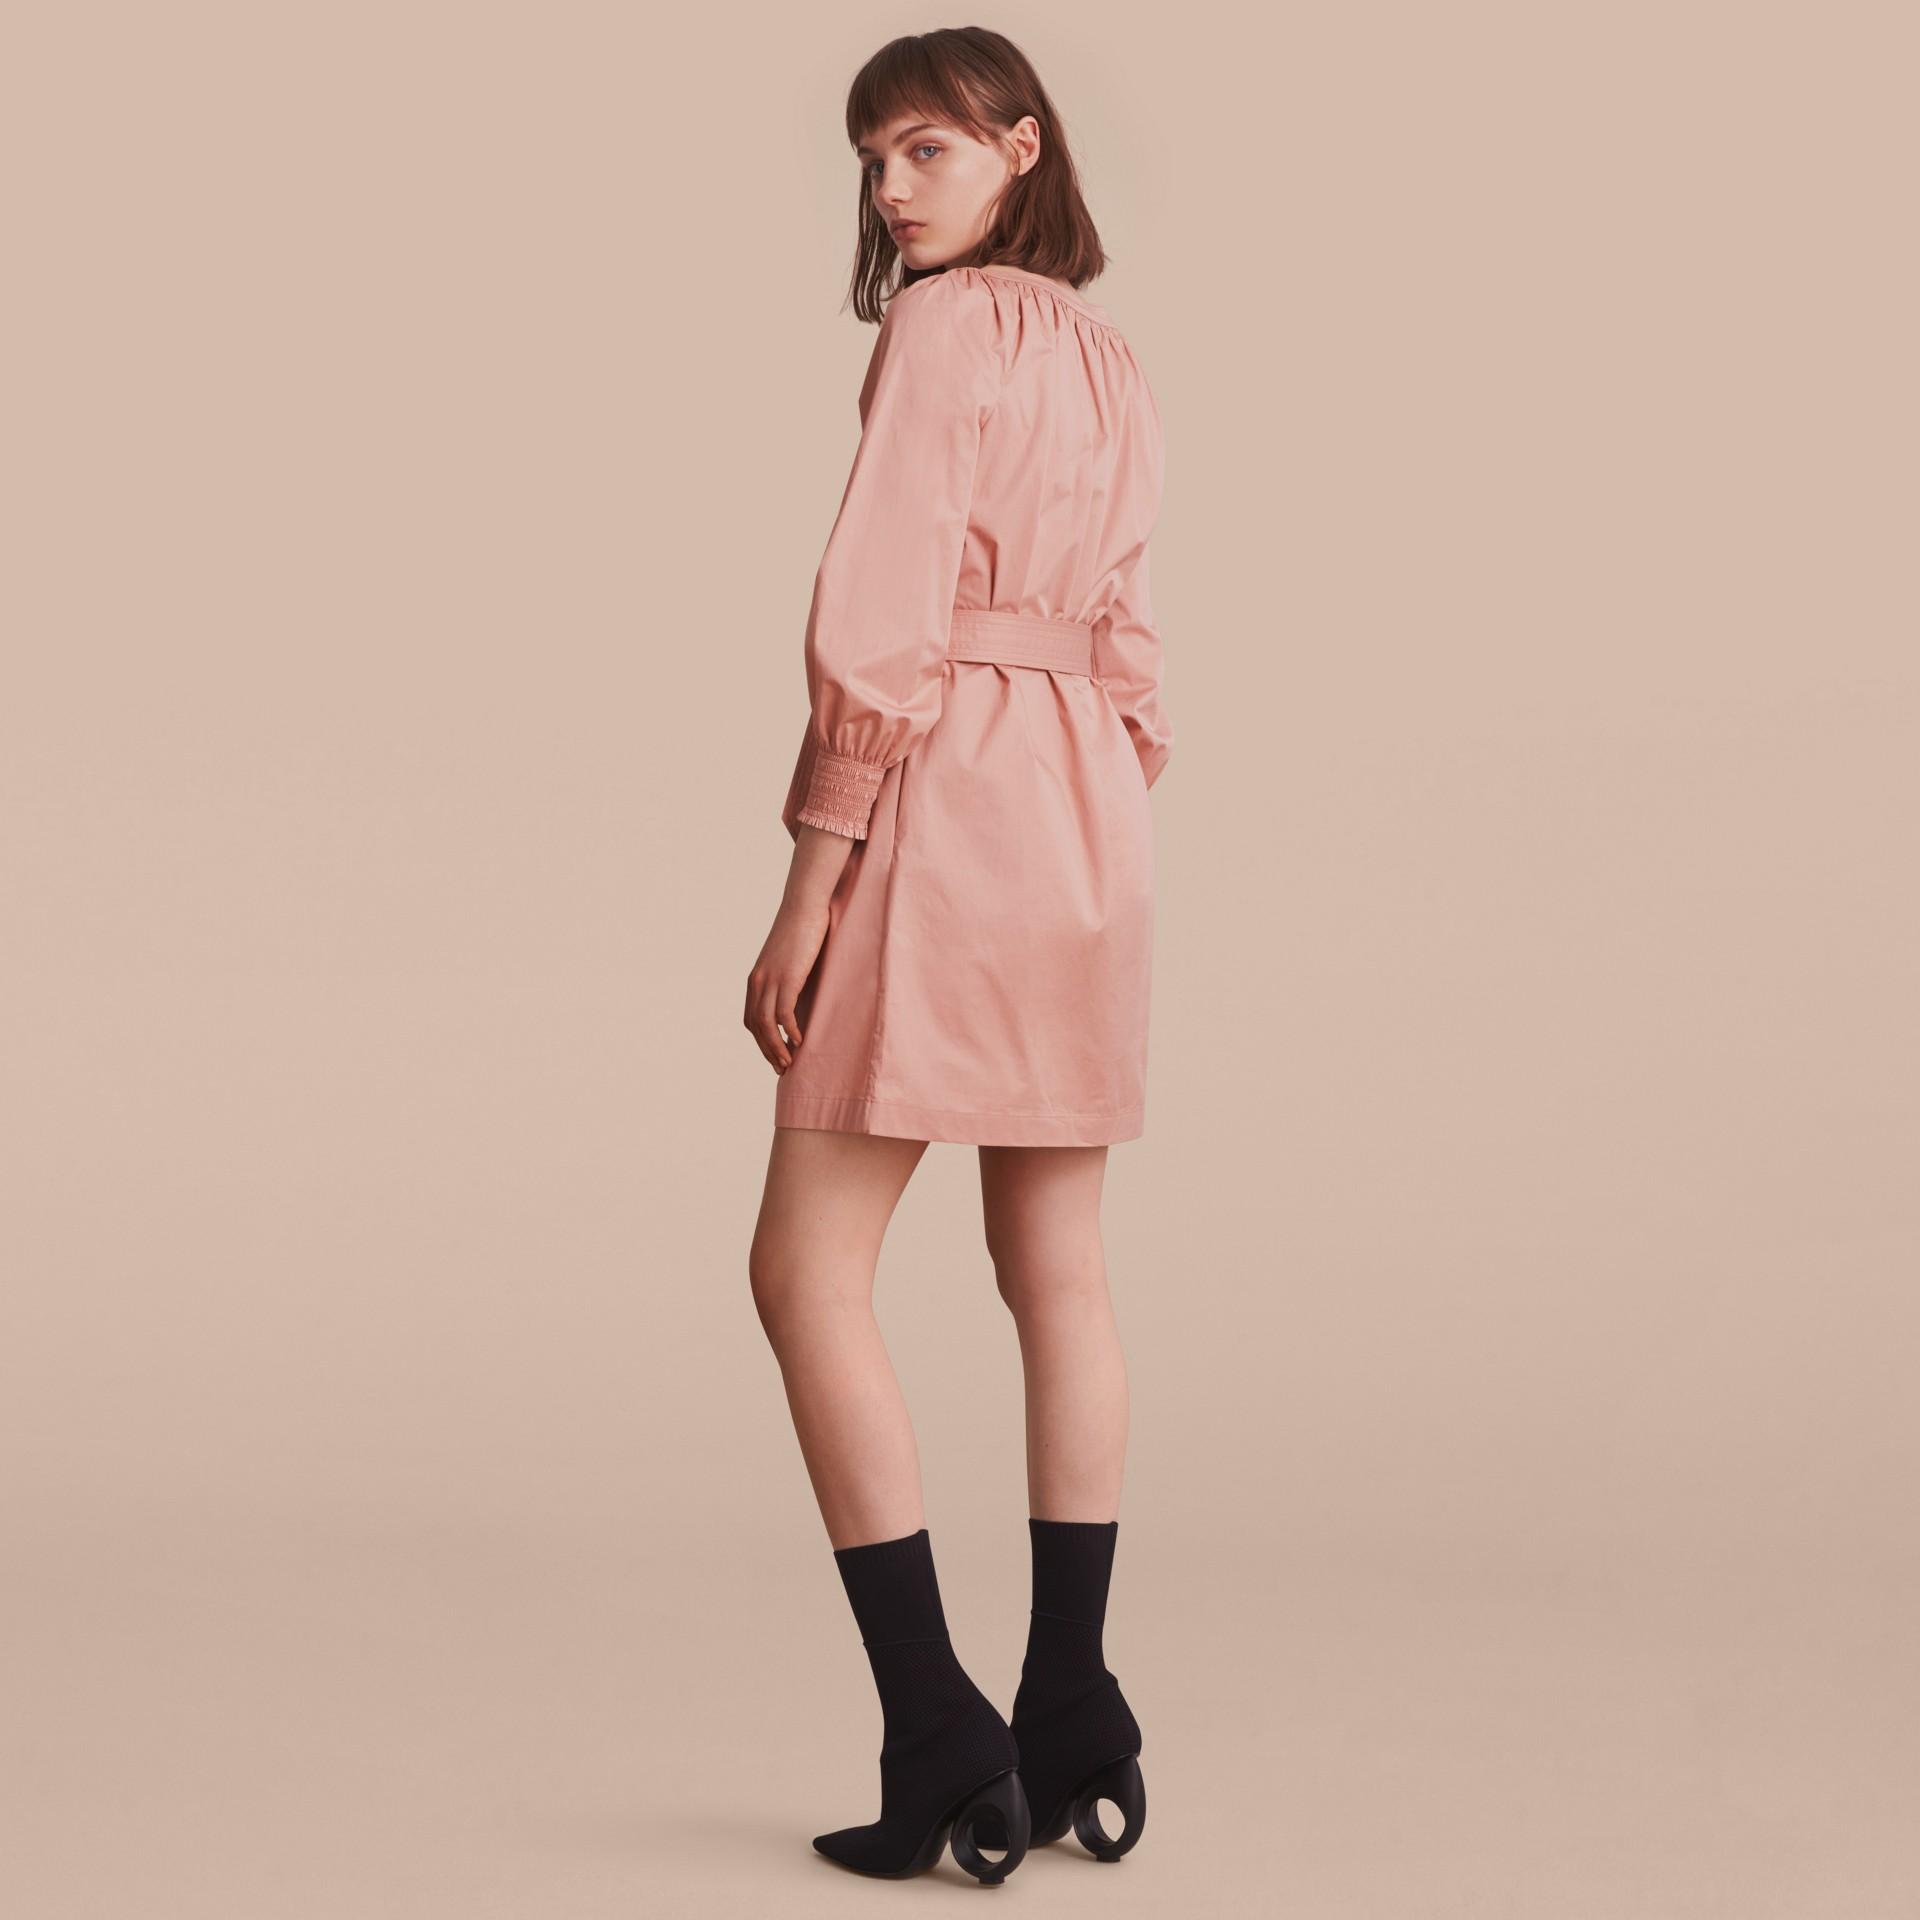 Smocked Cuff Stretch Cotton Dress - gallery image 3